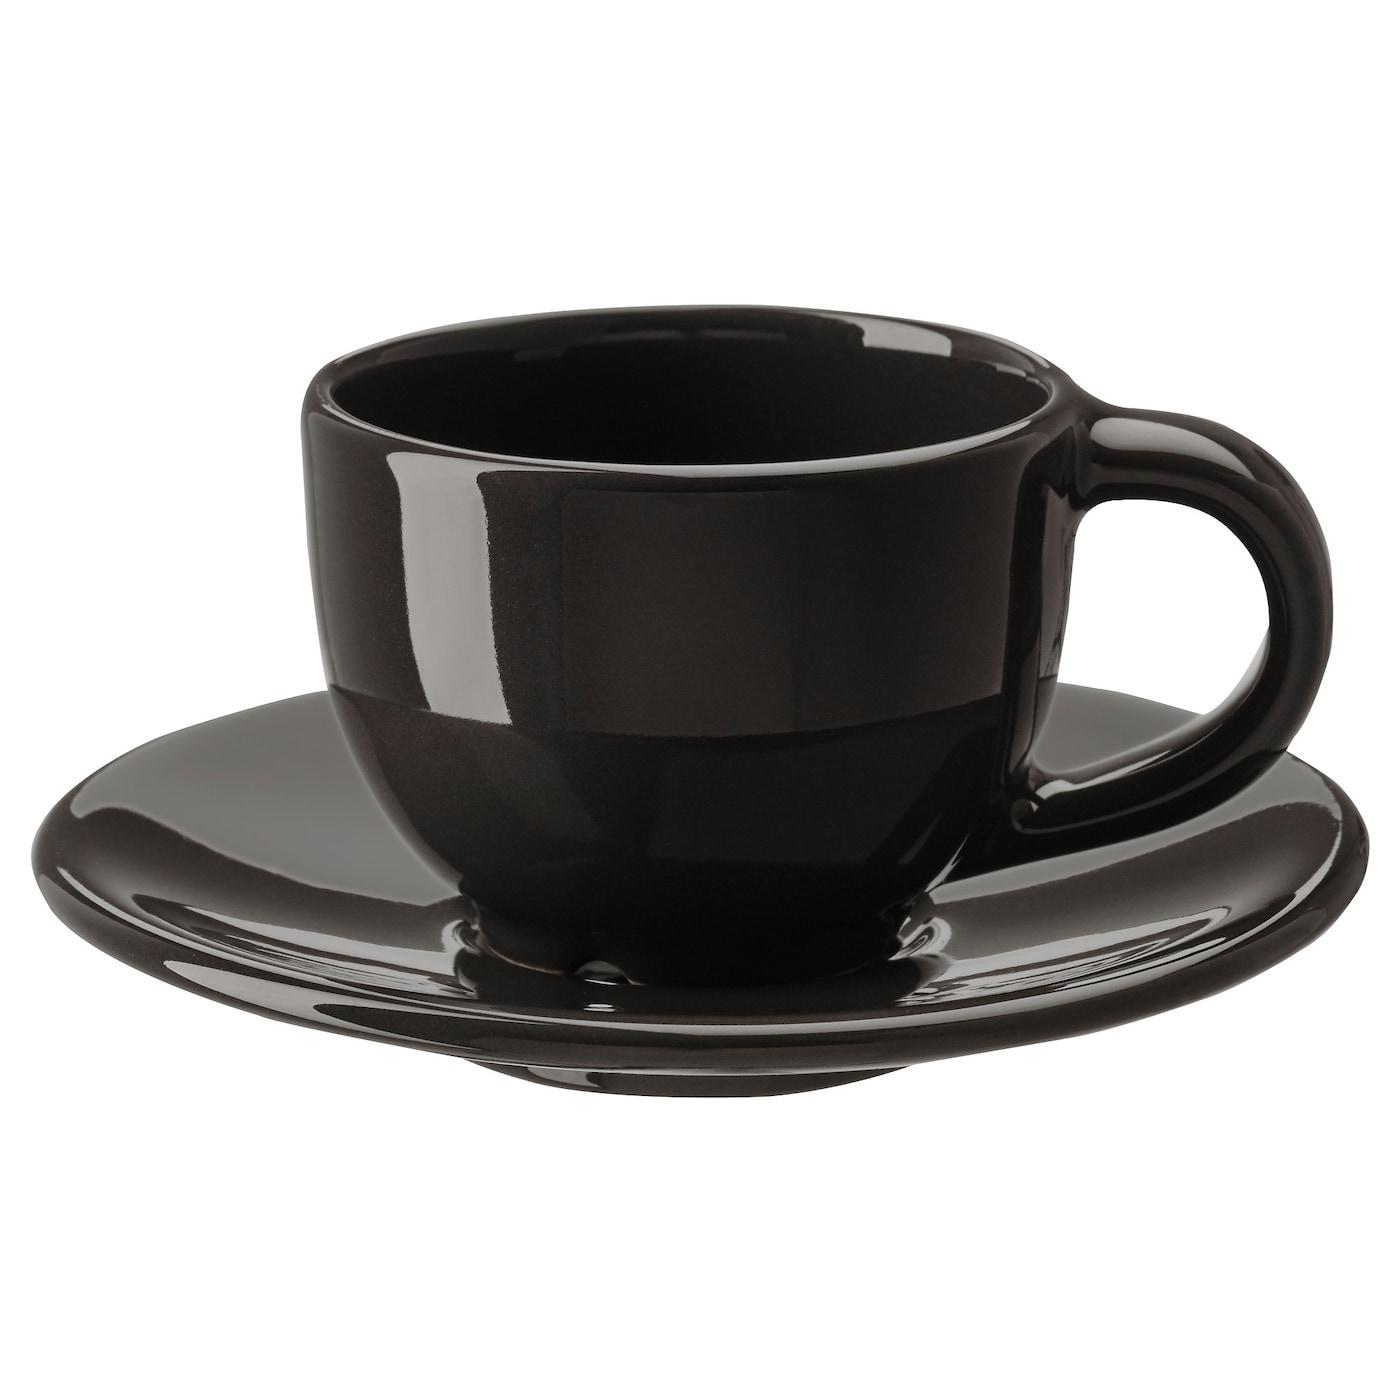 Glass espresso coffee cups uk - Ikea Vardagen Espresso Cup And Saucer